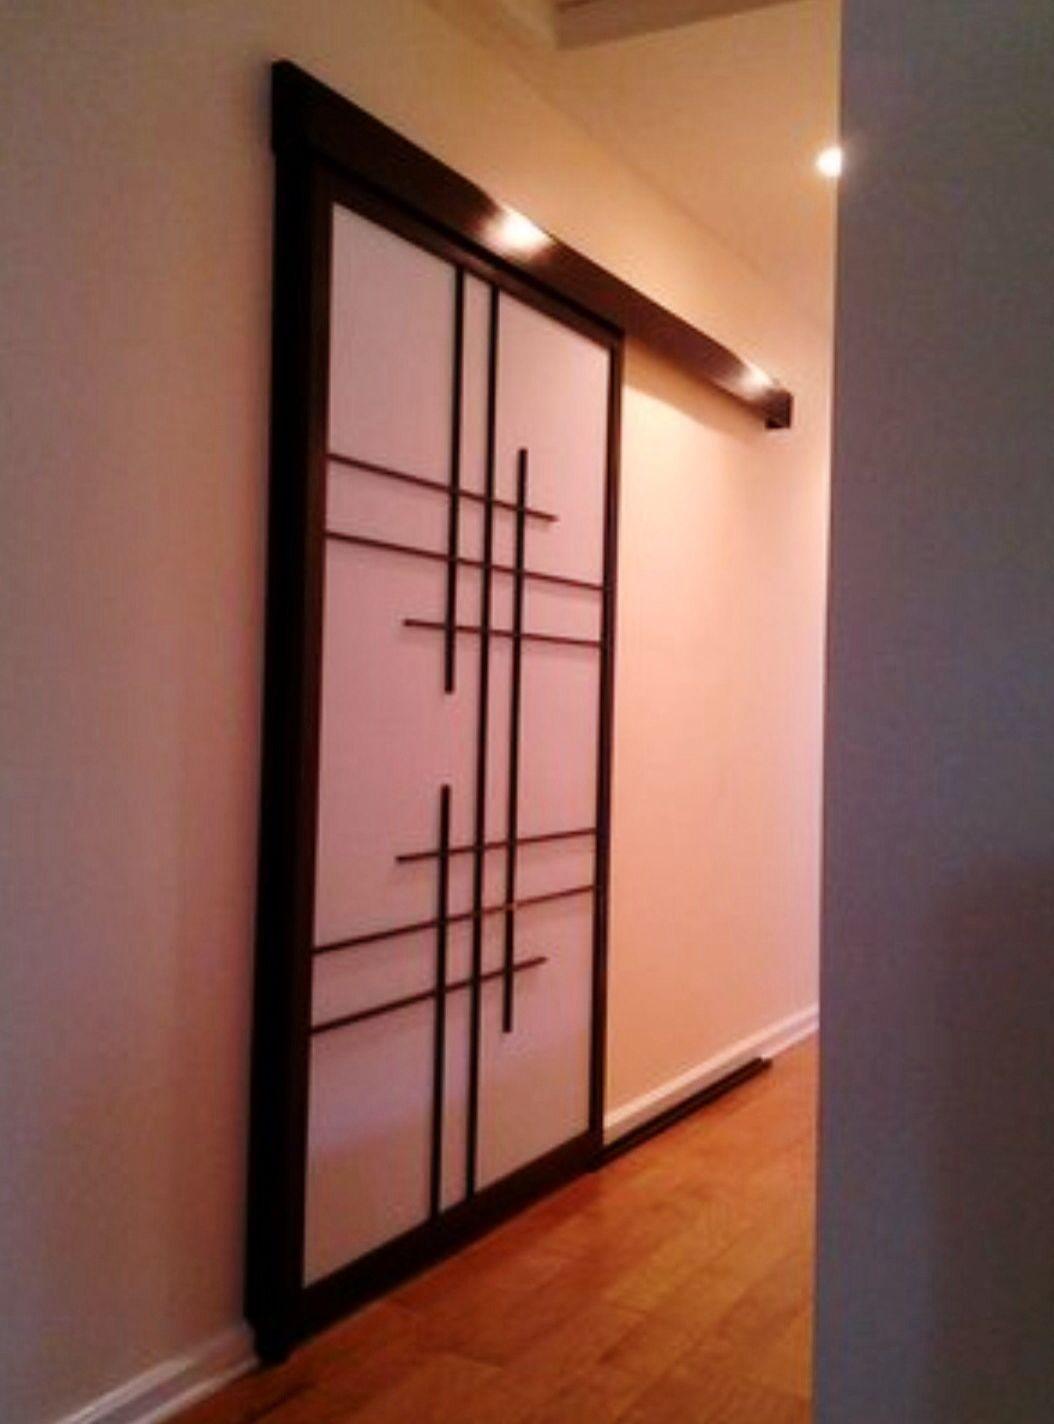 Cheap and easy diy ideas room divider desk interior design macrame